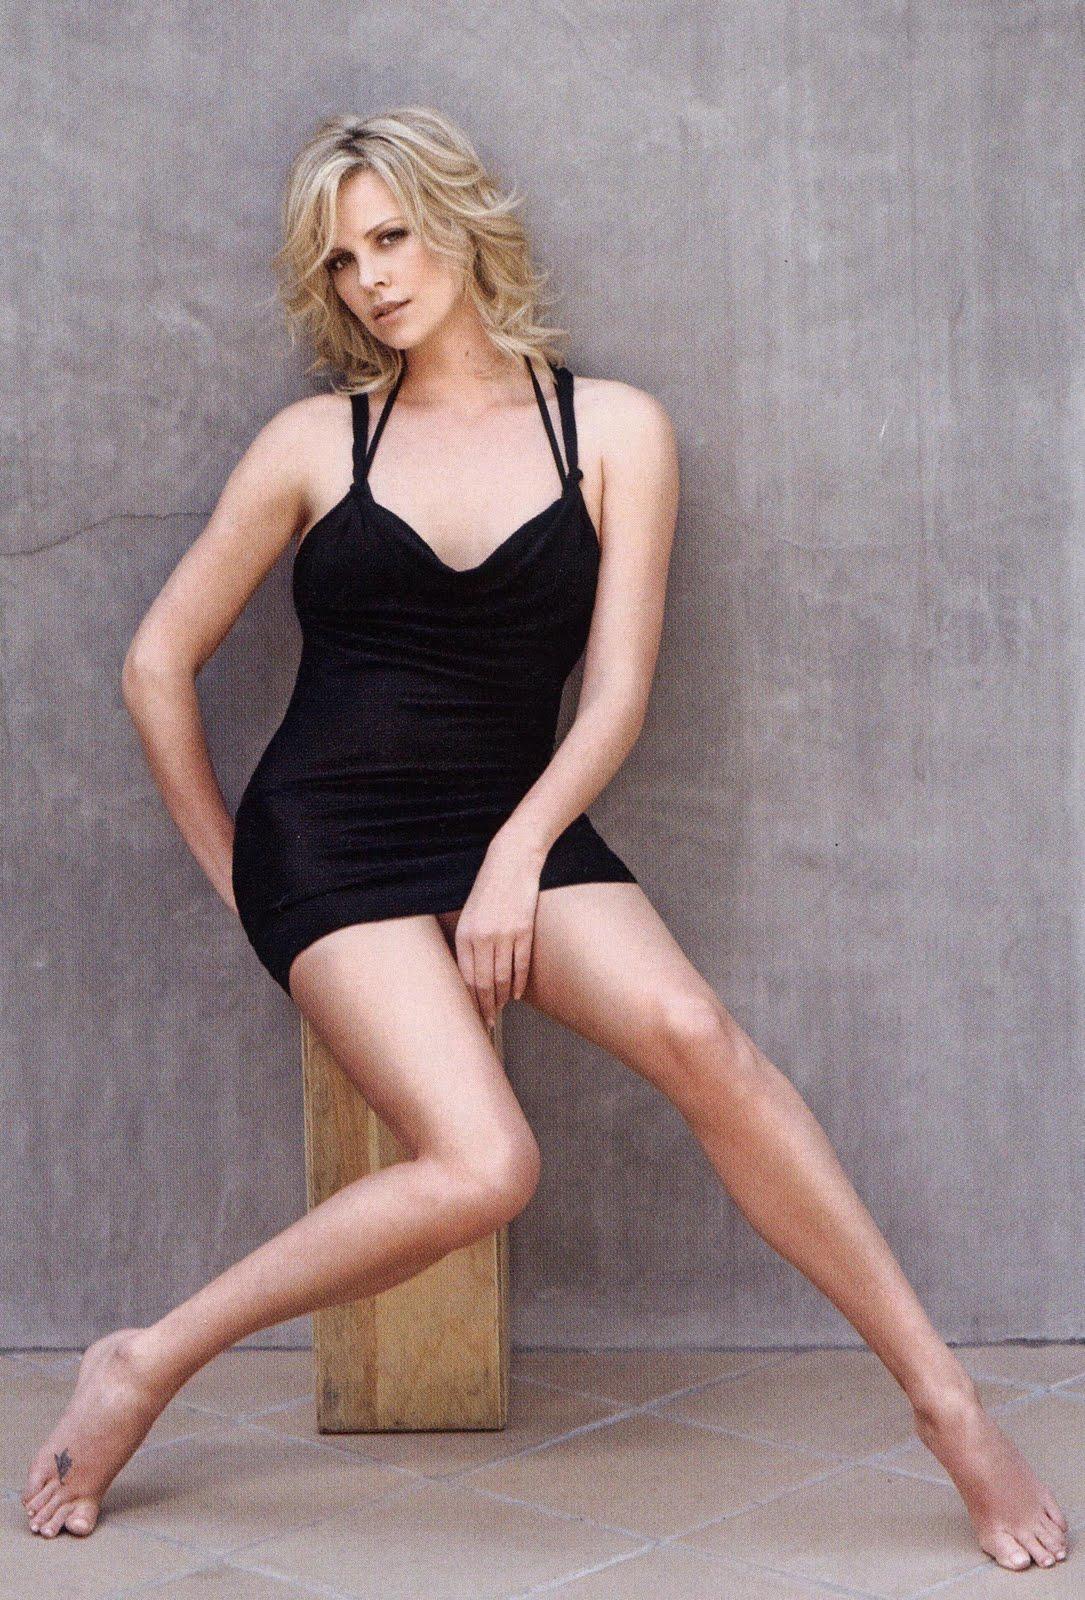 Tits Paris Smith naked (31 photo) Sideboobs, Facebook, legs